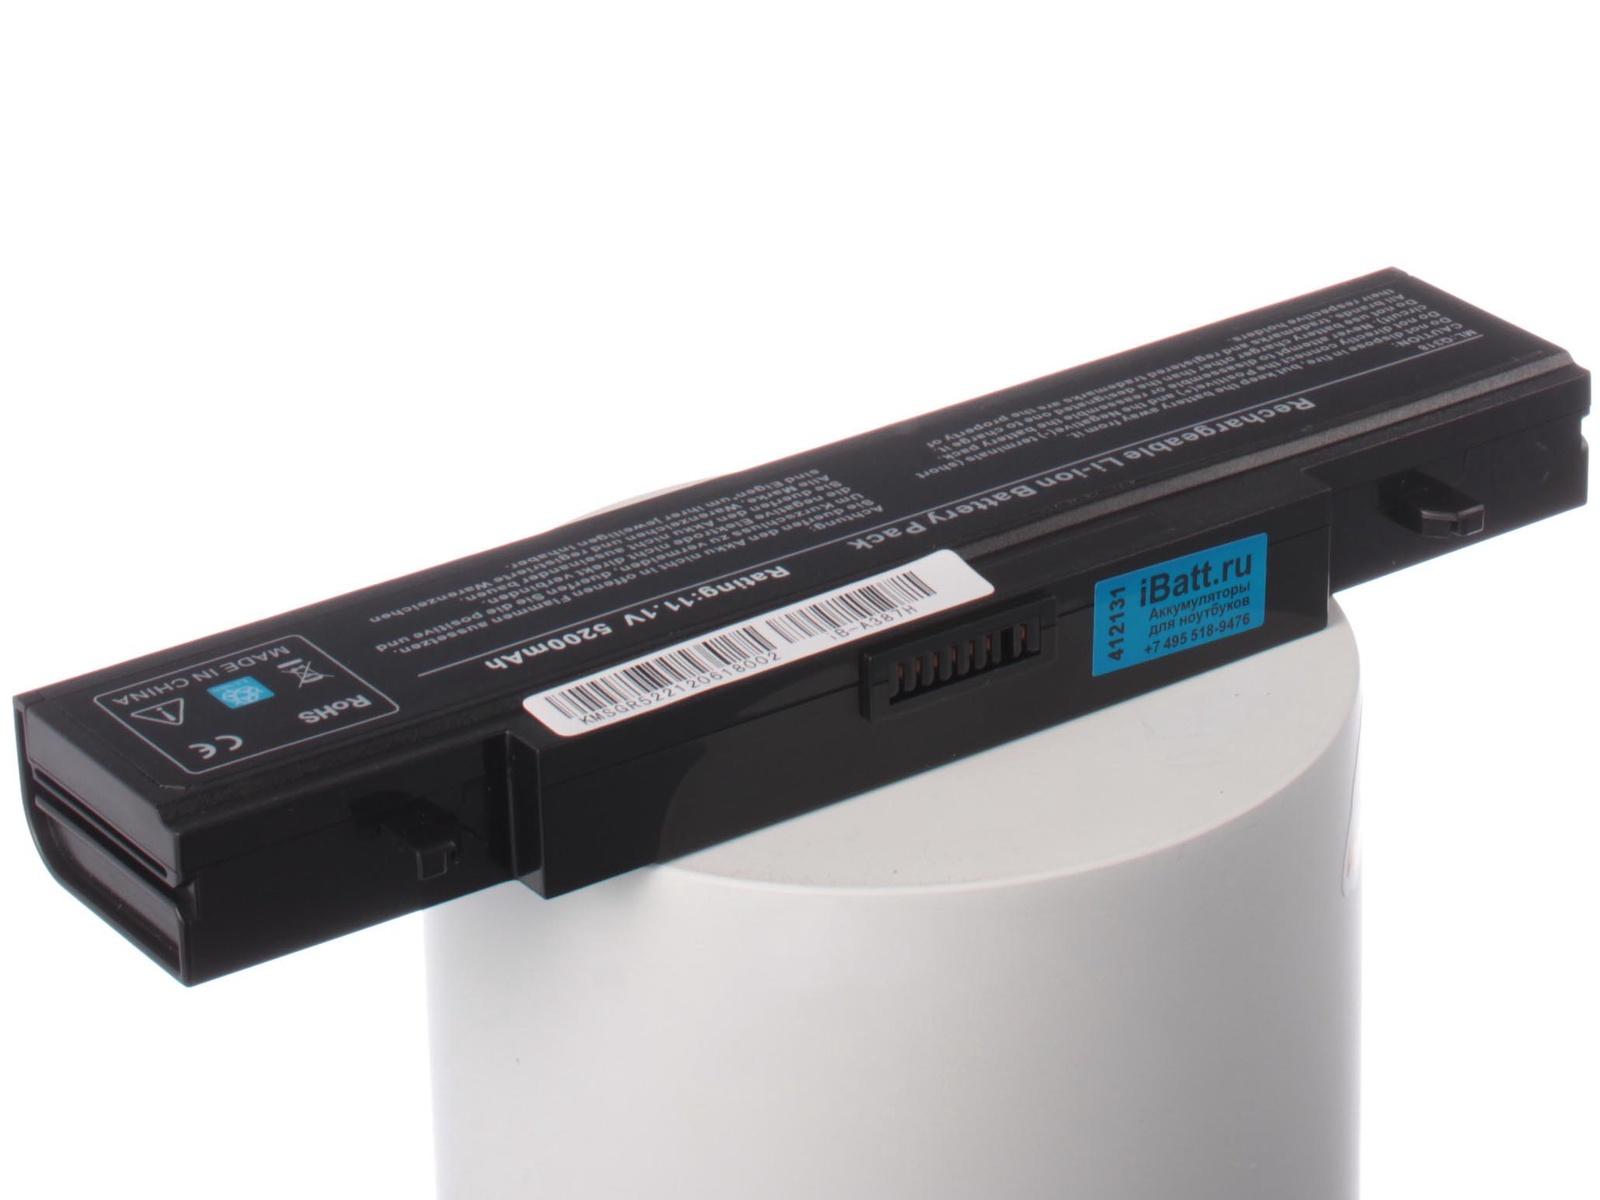 Аккумулятор для ноутбука iBatt для Samsung 355E5X, RV518, RV720, 350E7C, 355E5C, 305E7A, NP-R590, 350V5X, ATIV Book 2, NP-R440L, NP-R522, NP-R469, Q530, Q430, R423, 200A5B, 305V5A-S0K, 355V5X, 355E5X-A01, 300E7Z-S02, 200A4B аккумулятор для ноутбука ibatt для samsung 355e5x rv518 rv720 350e7c 355e5c 305e7a np r590 350v5x ativ book 2 np r440l np r522 np r469 q530 q430 r423 200a5b 305v5a s0k 355v5x 355e5x a01 300e7z s02 200a4b